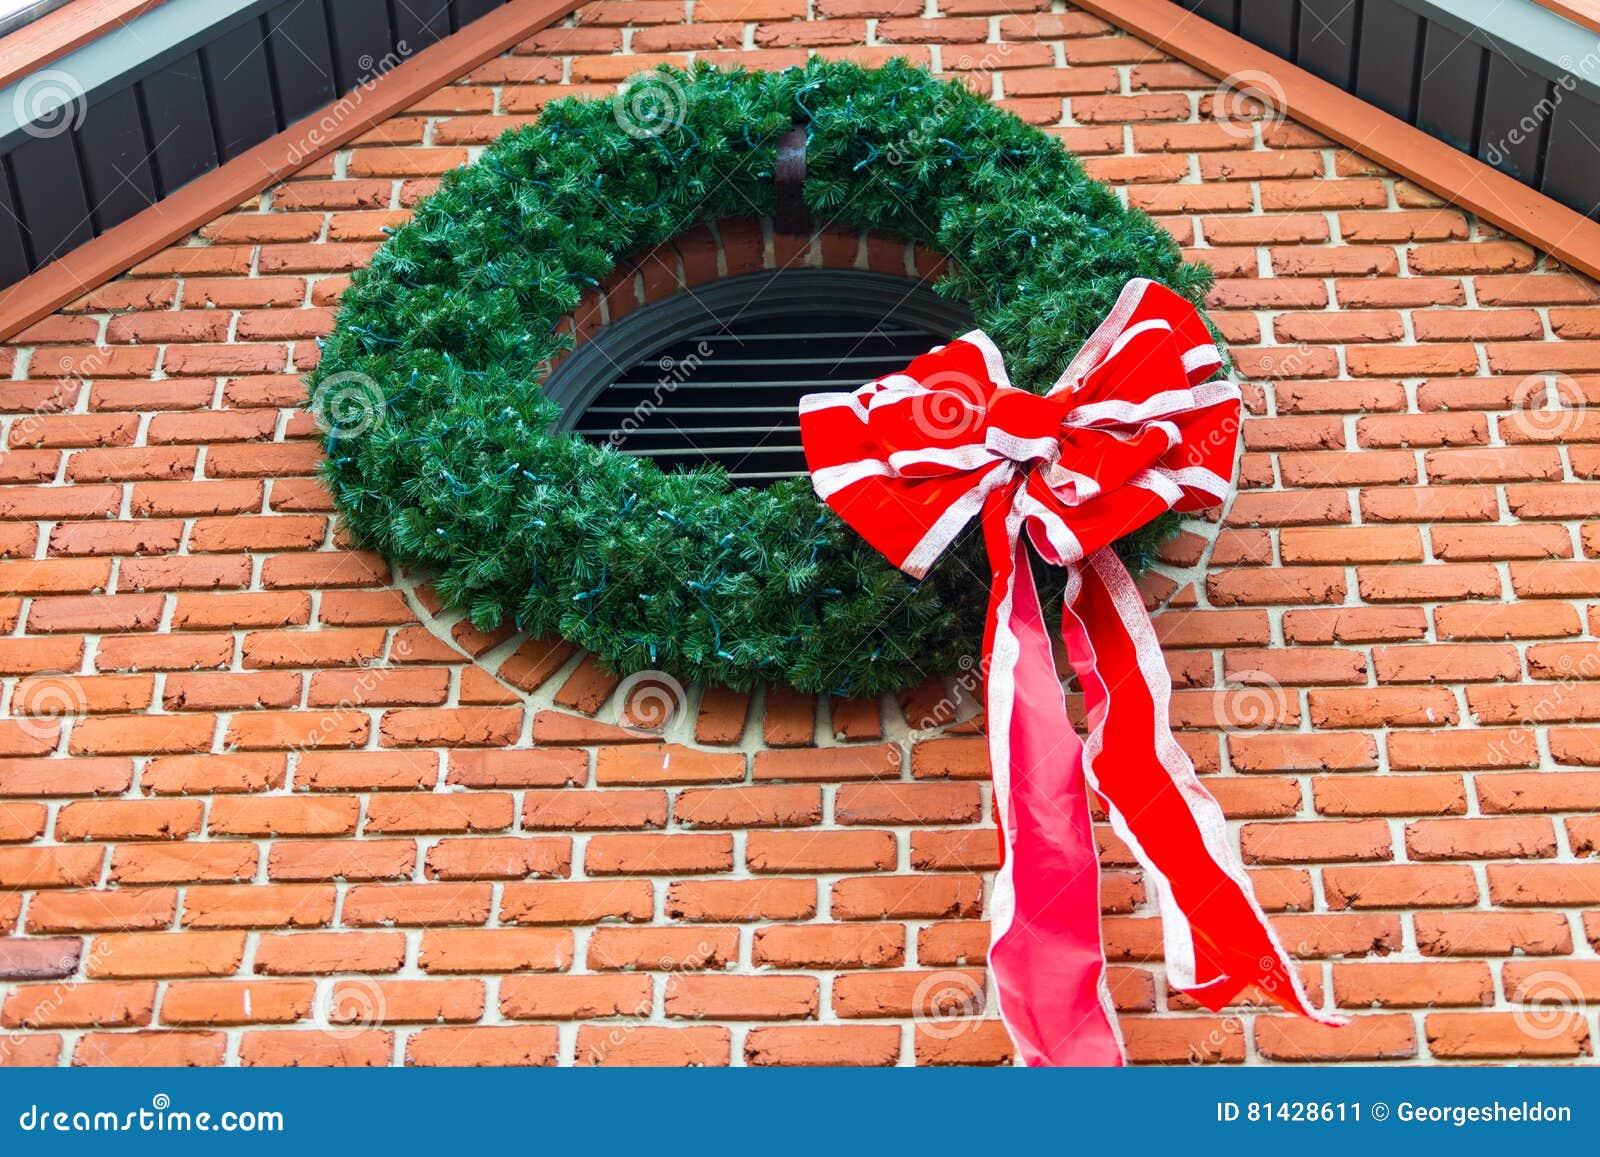 christmaswreath on the brick wall